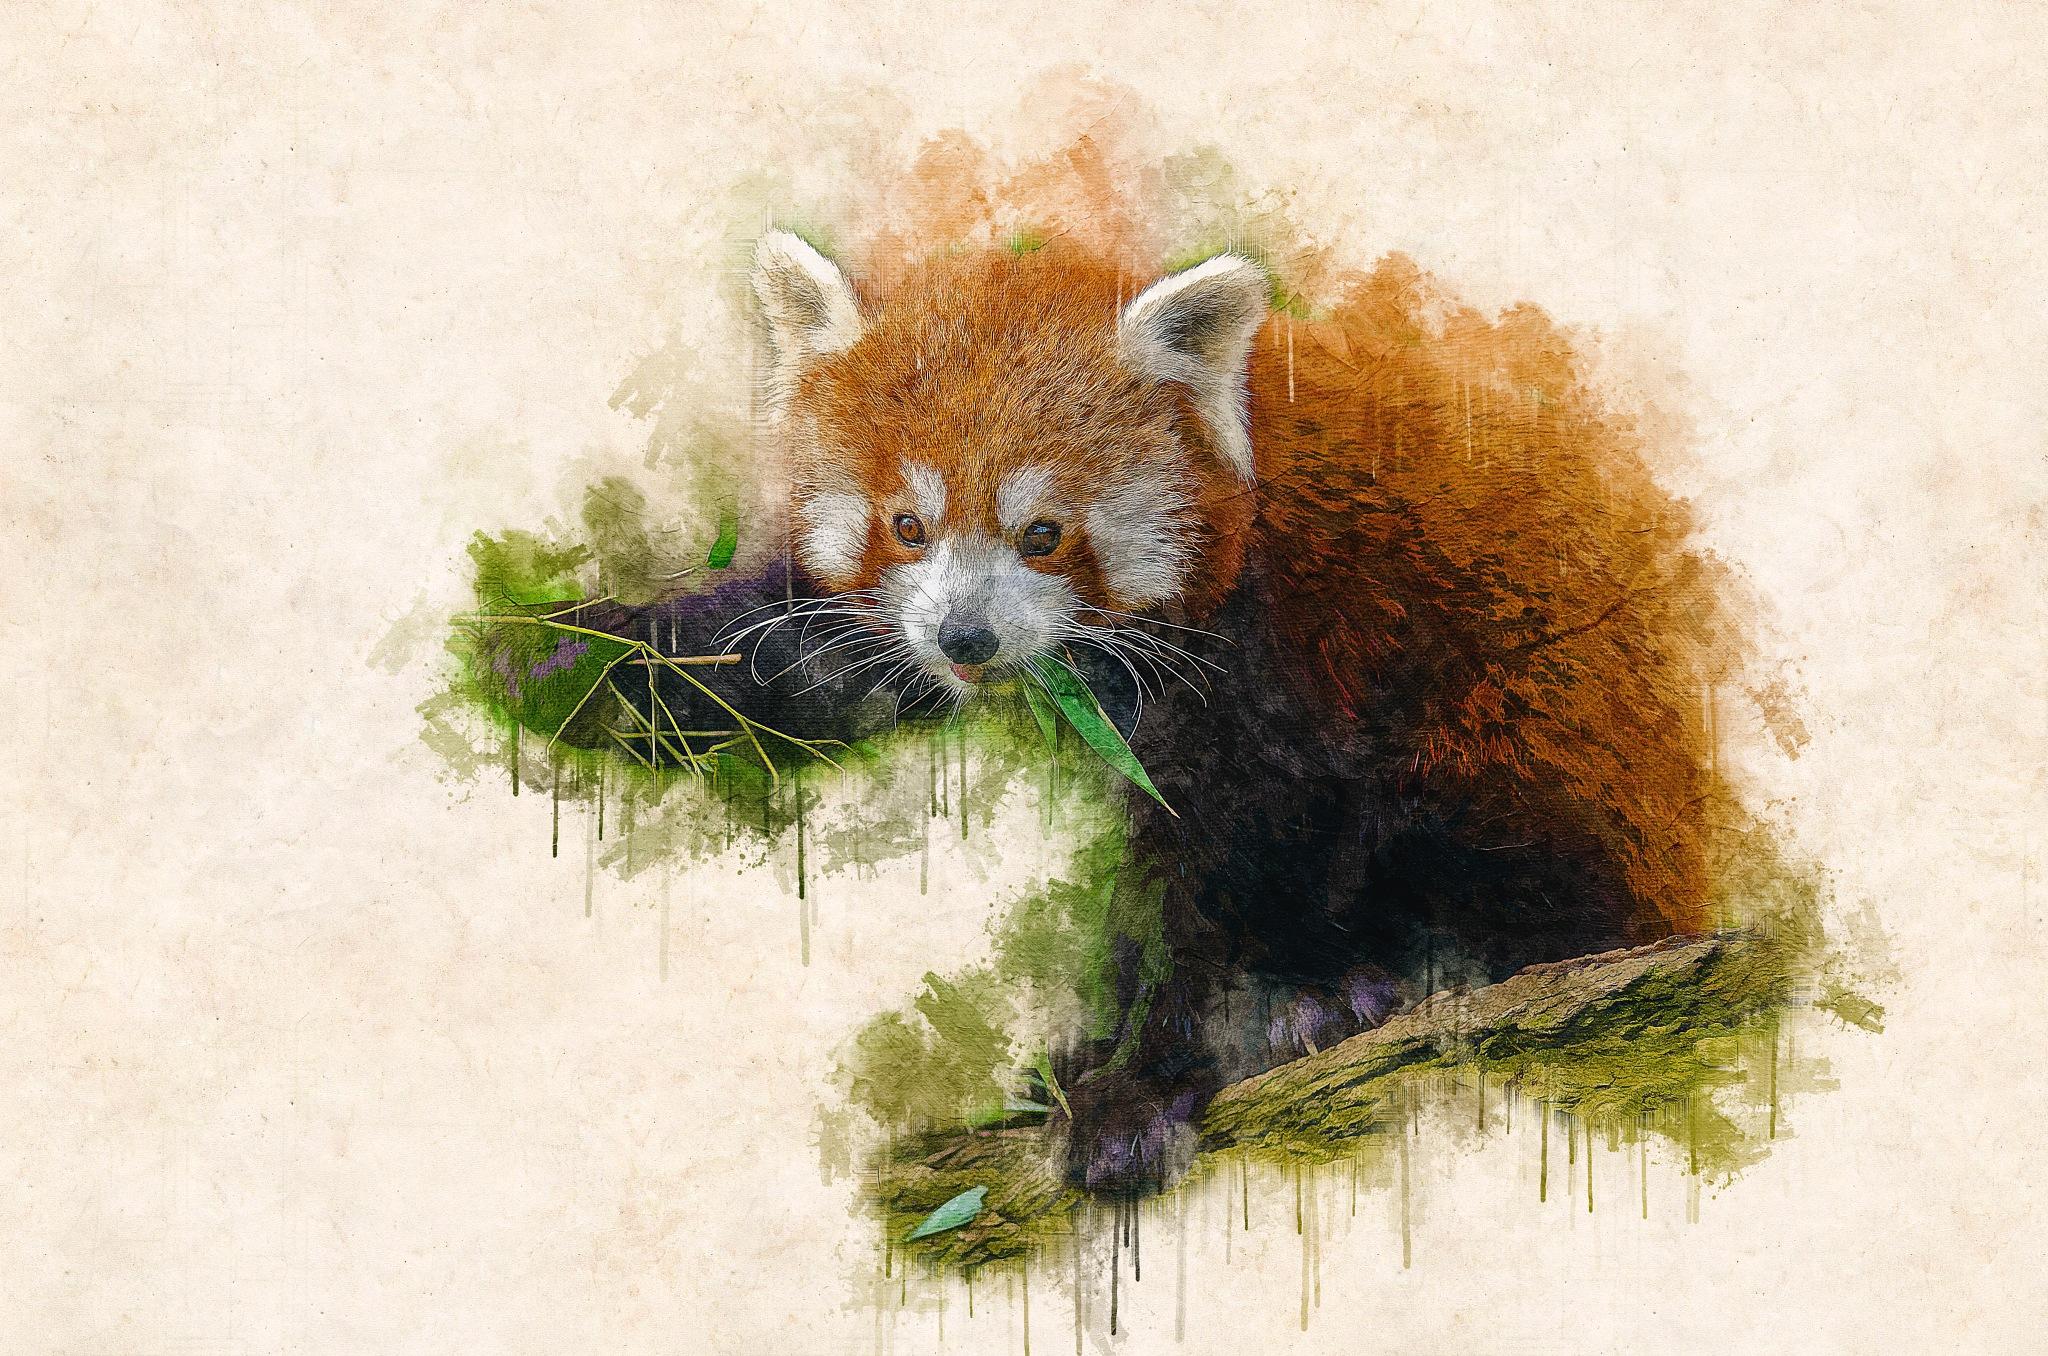 Red Panda by Brigitte Werner